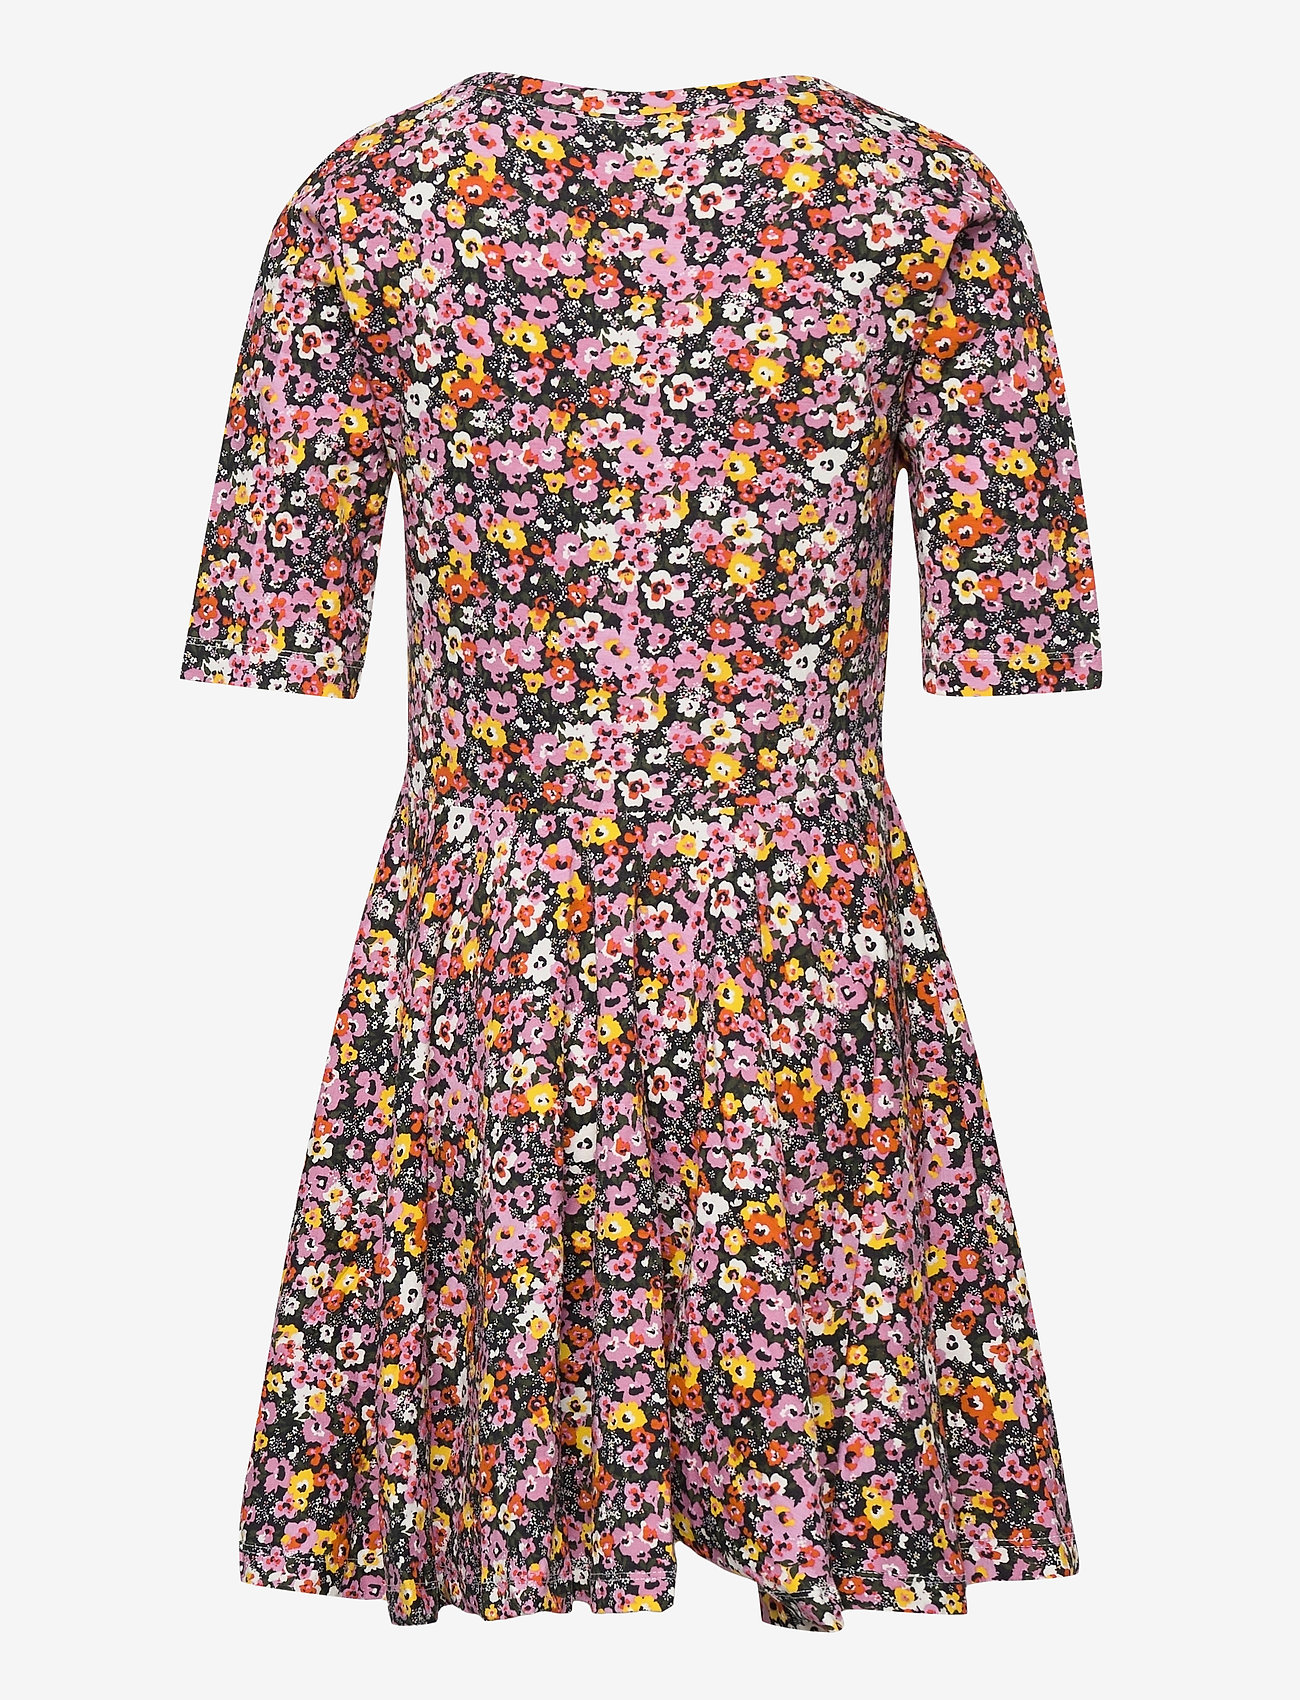 The New - TRY S_S DRESS - jurken - floral aop - 1